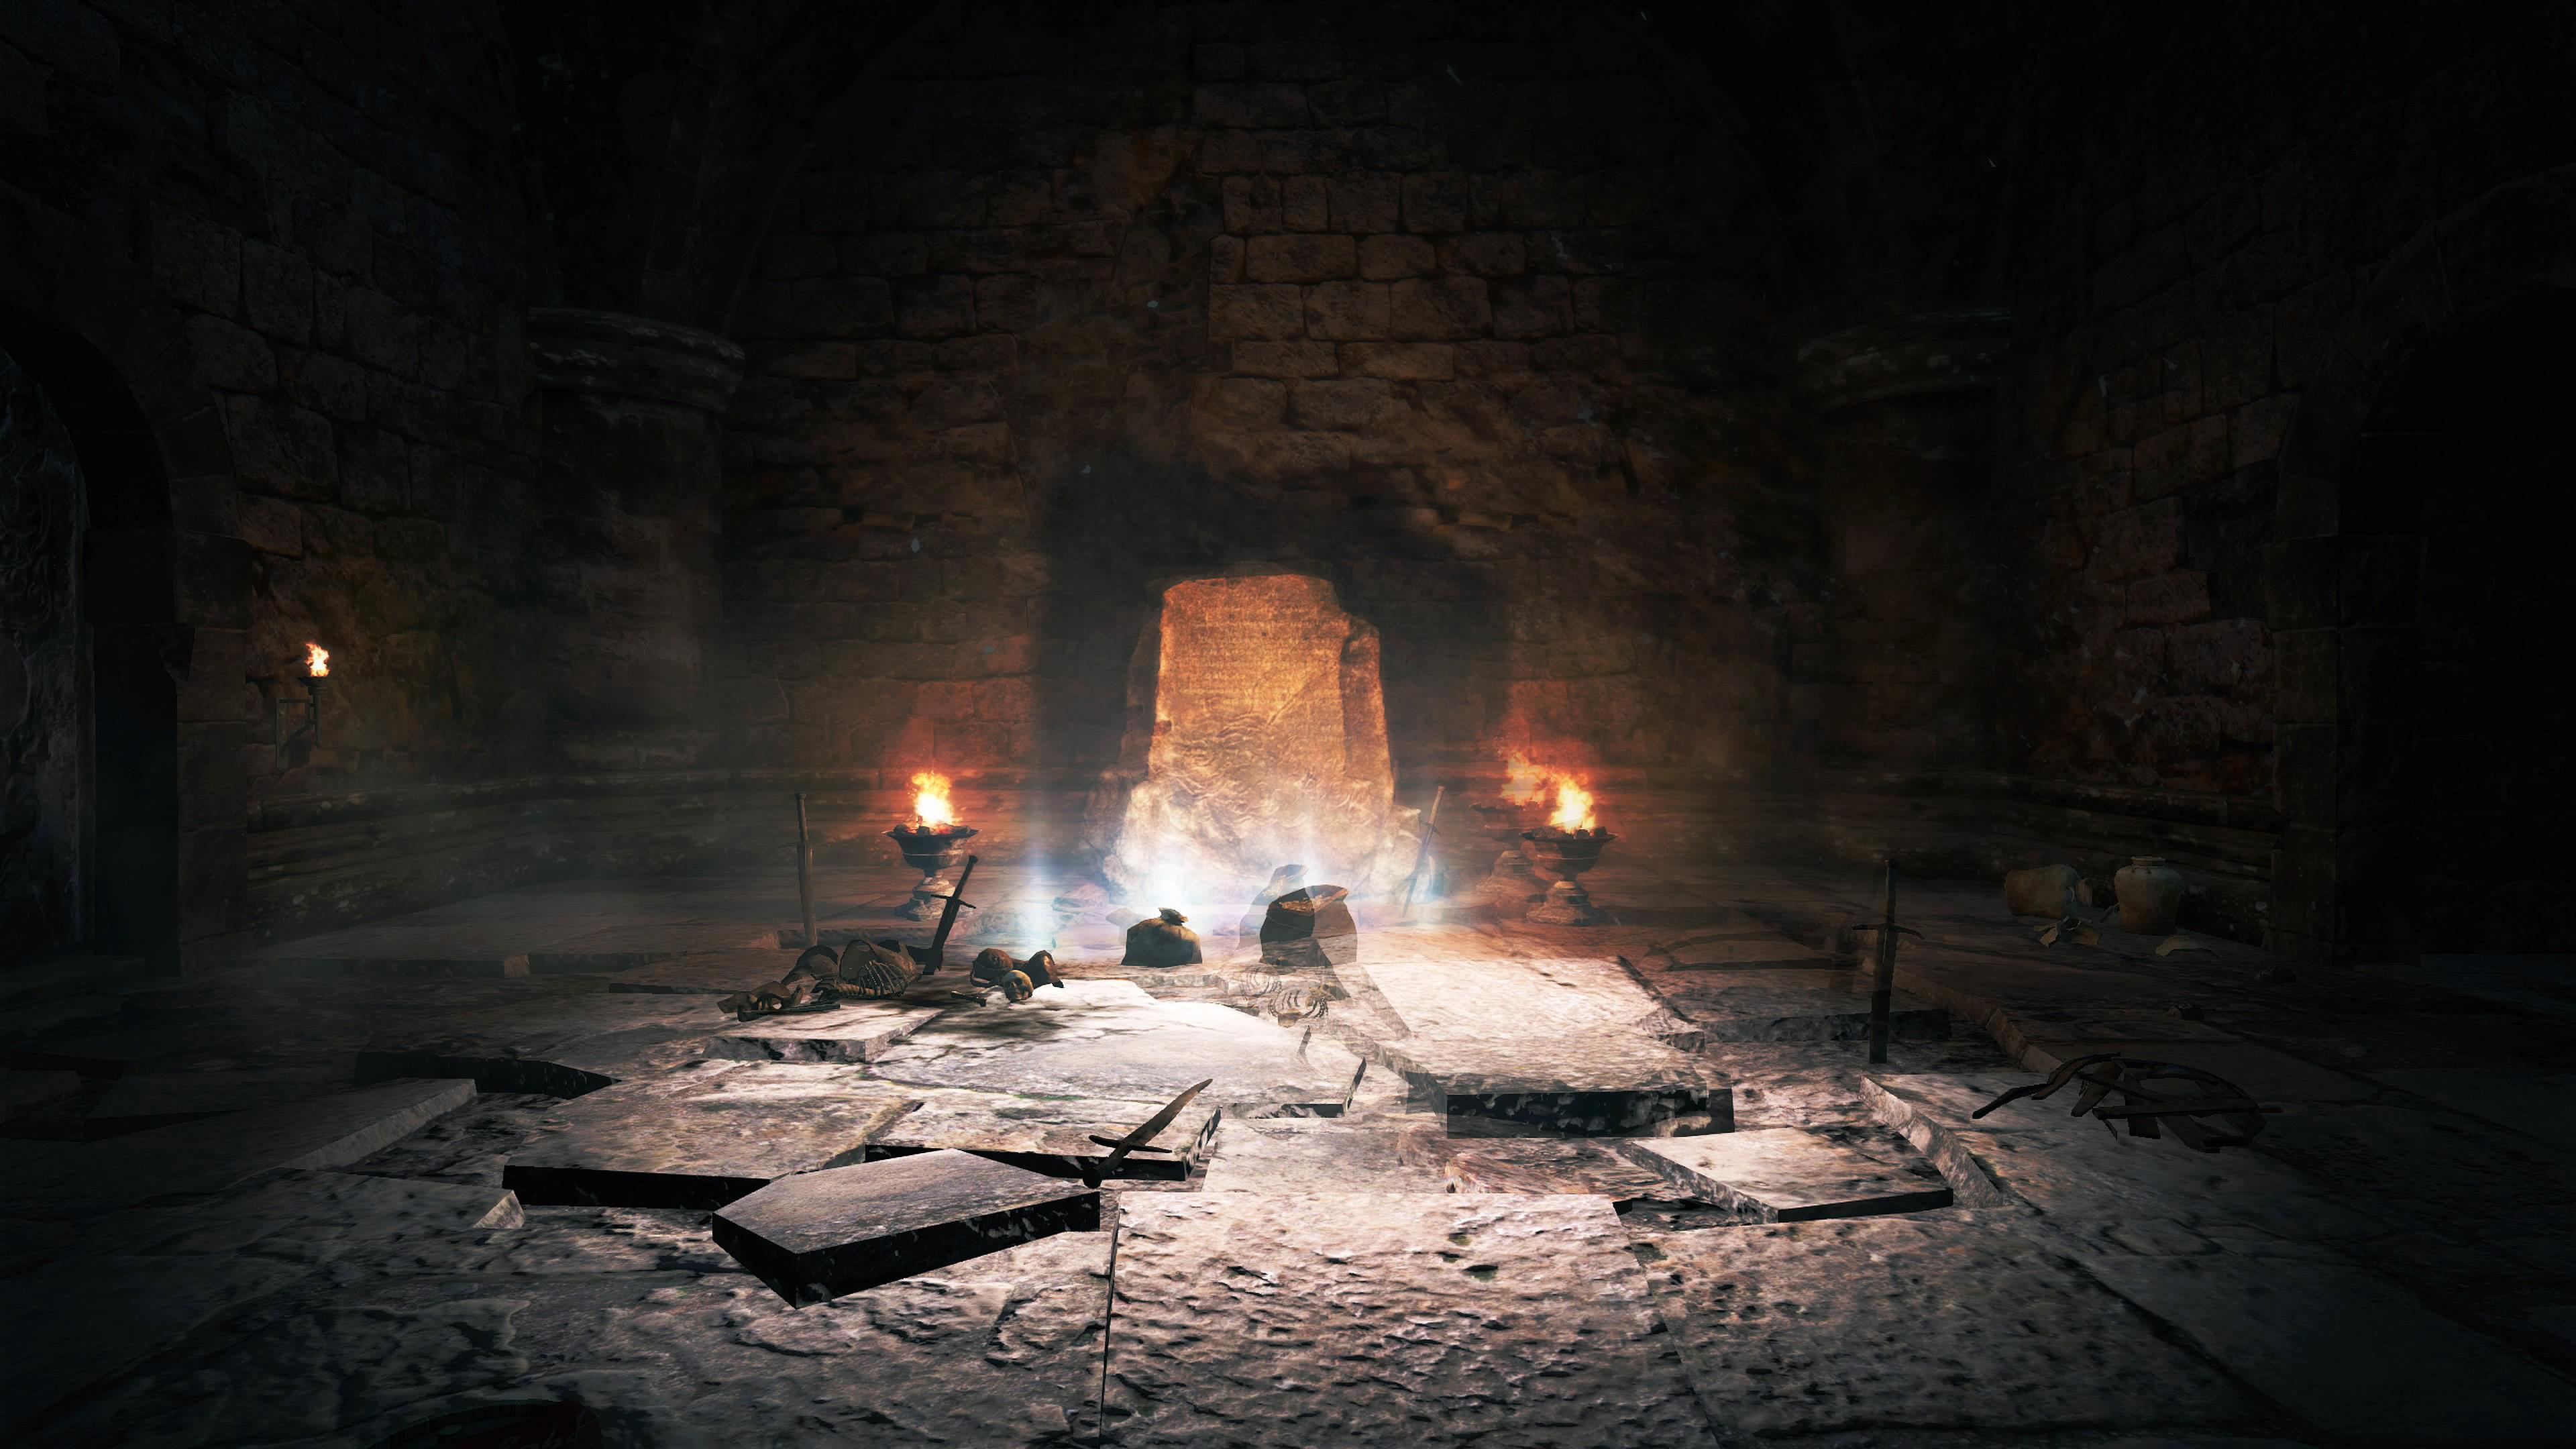 3. října vyjde Dragon's Dogma: Dark Arisen pro PS4 a Xbox One 148230